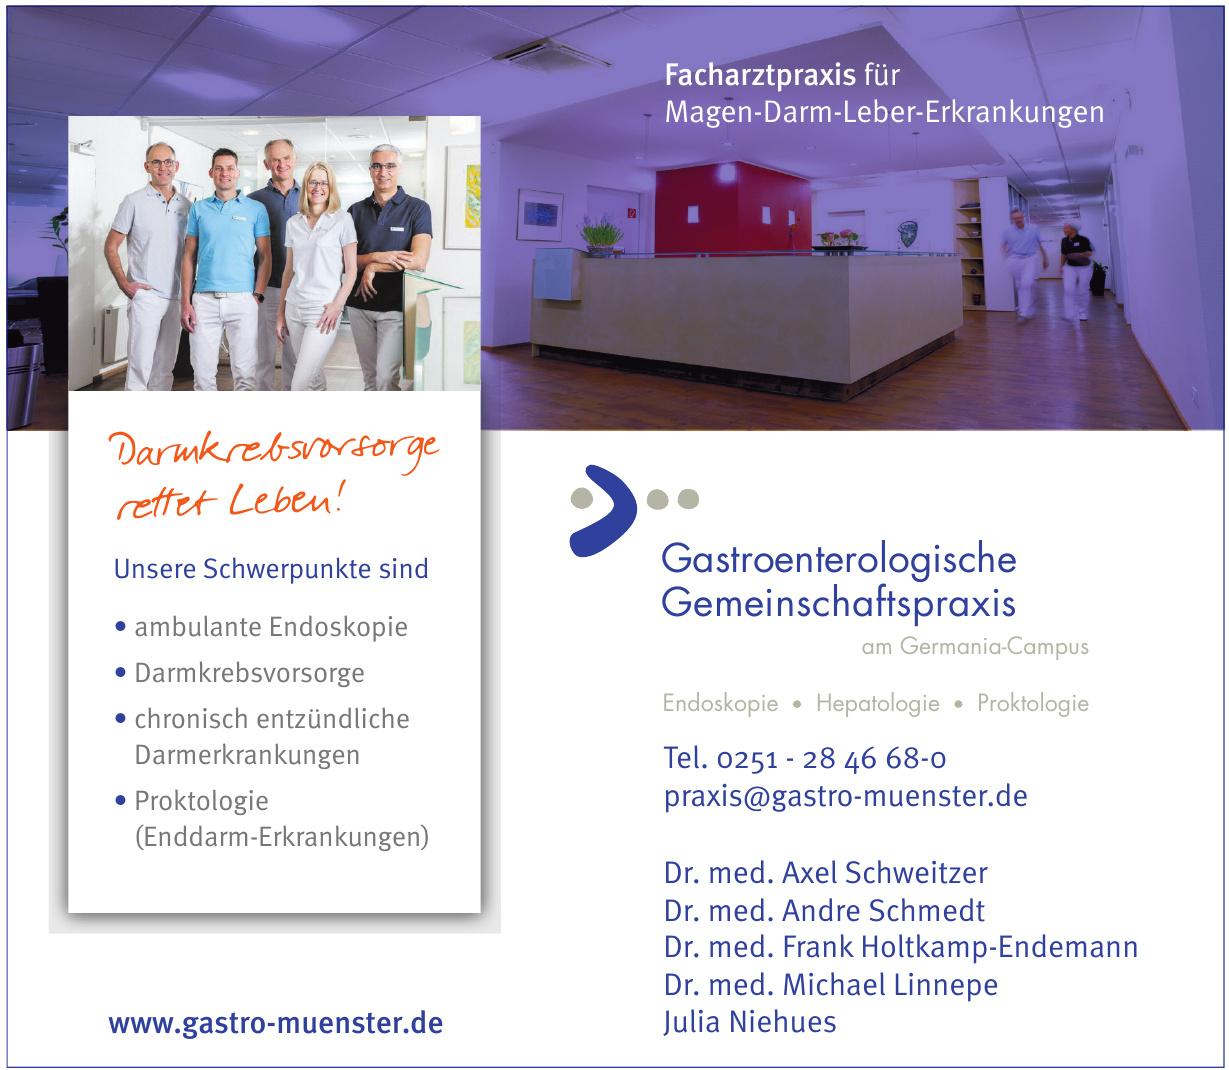 Gastroenterologische Gemeinschaftspraxis